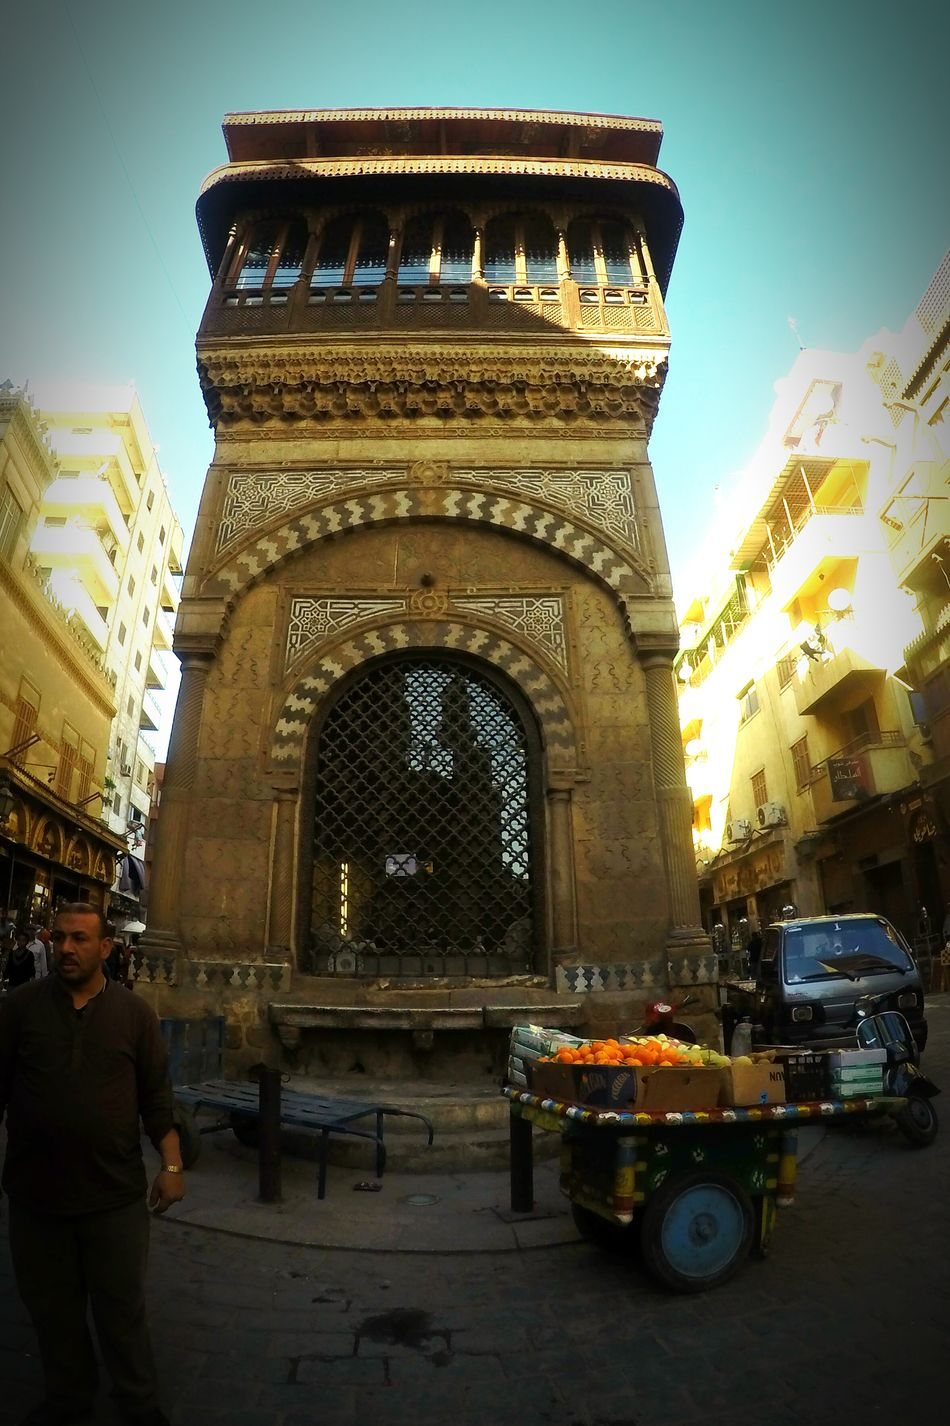 City Building Exterior Architecture Cityscape Historic Egypt Egyptian Myegypt Ancient Architecture Travel Destinations Cairo Khanelkhalili Almoez Street Old Building